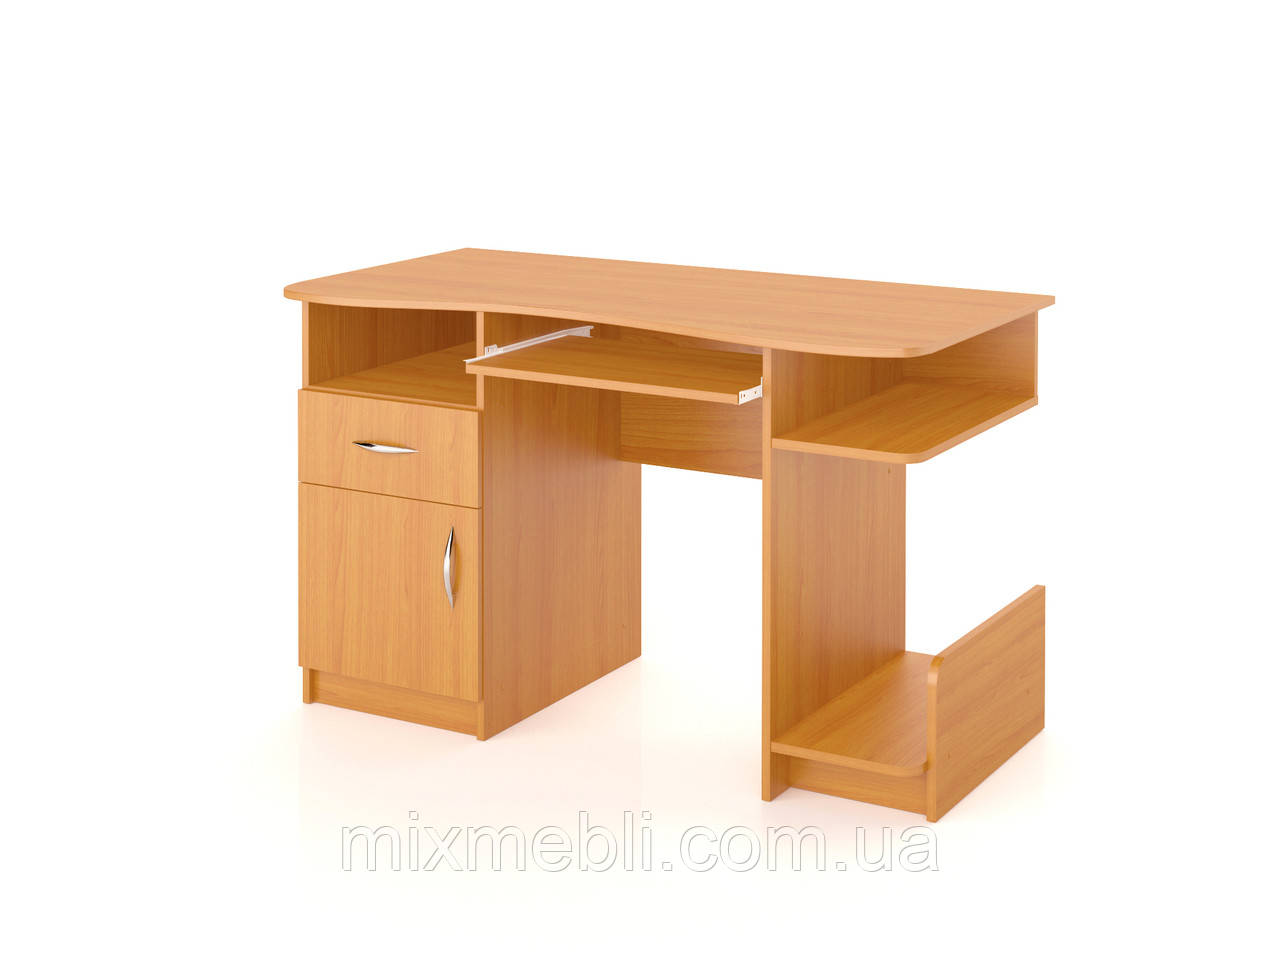 Арт стол ОПТИМА